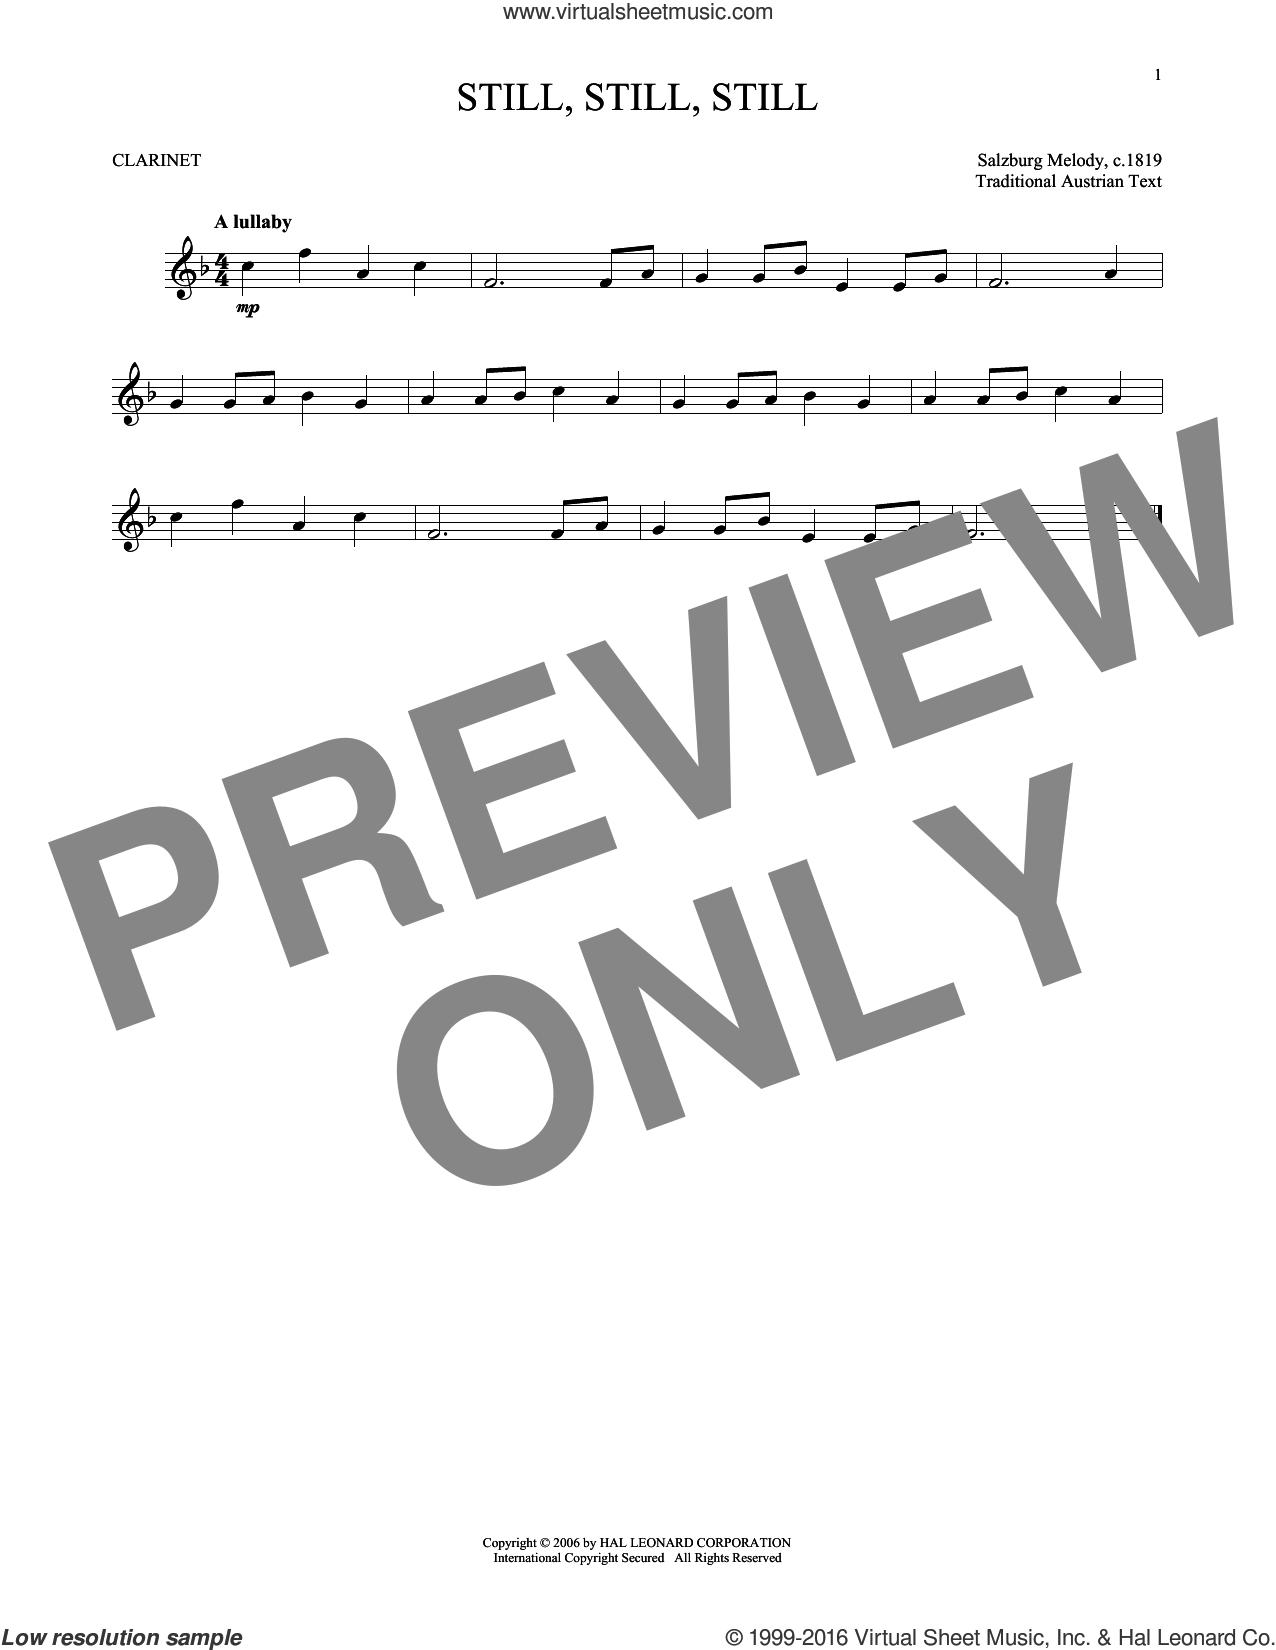 Still, Still, Still sheet music for clarinet solo by Salzburg Melody c.1819 and Miscellaneous, intermediate skill level